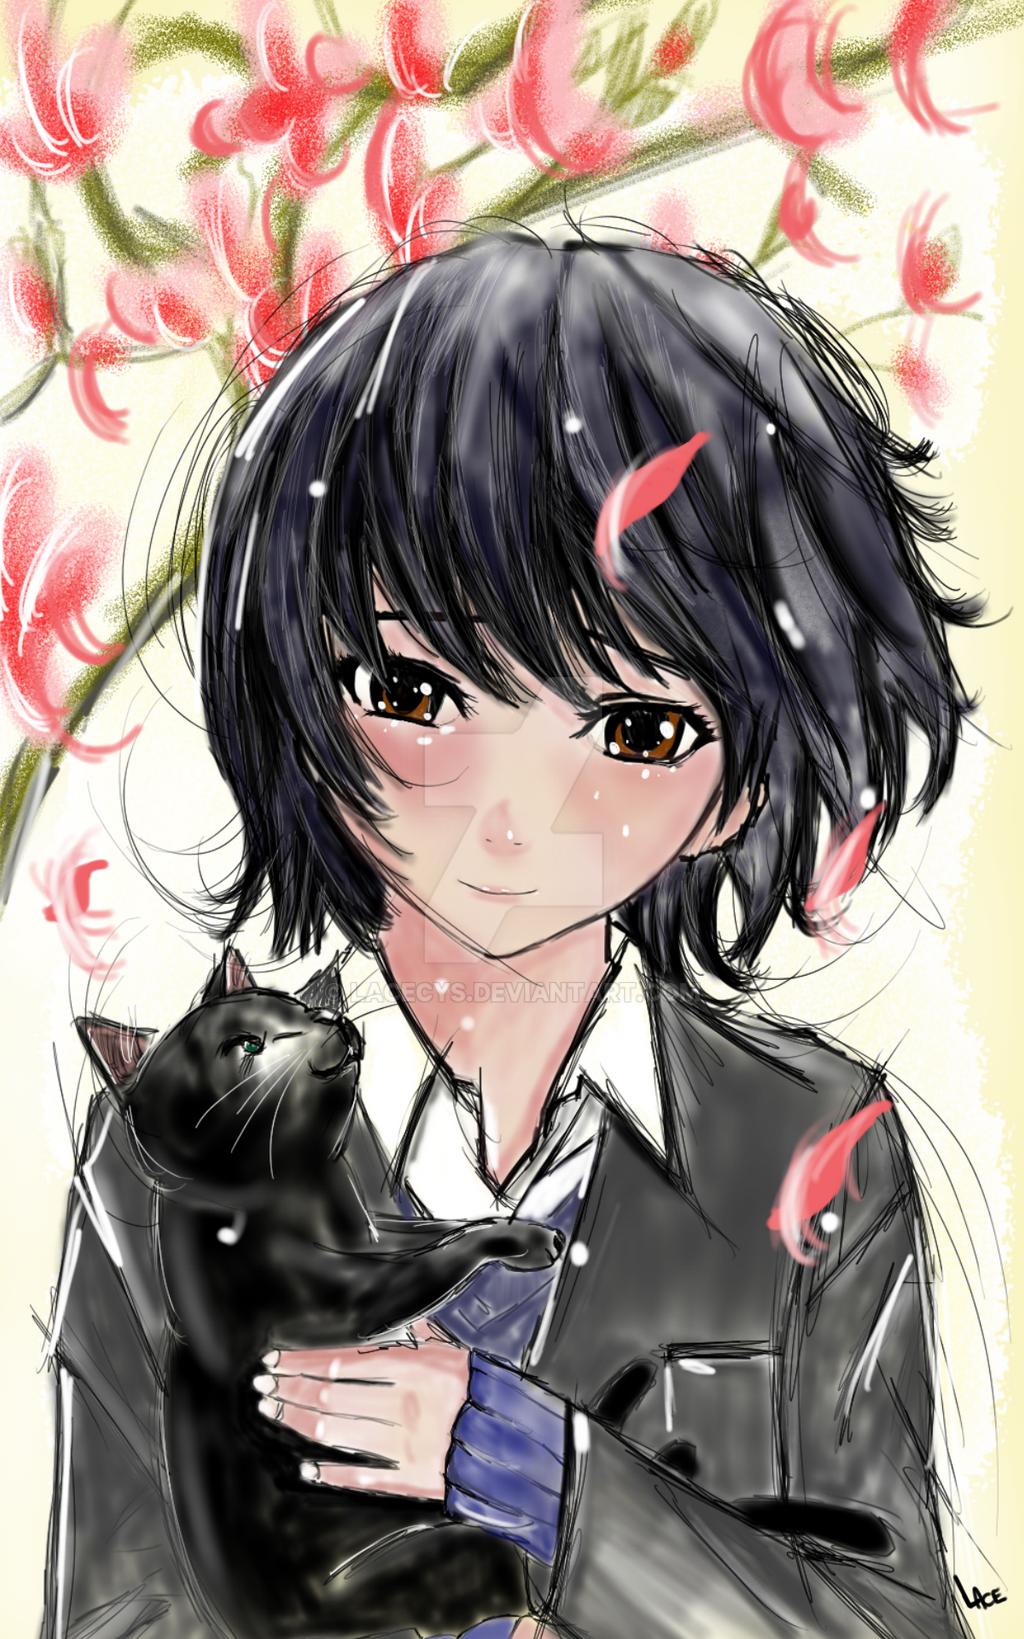 Dessin Fille Style Manga Par Lace By Lacecys On Deviantart